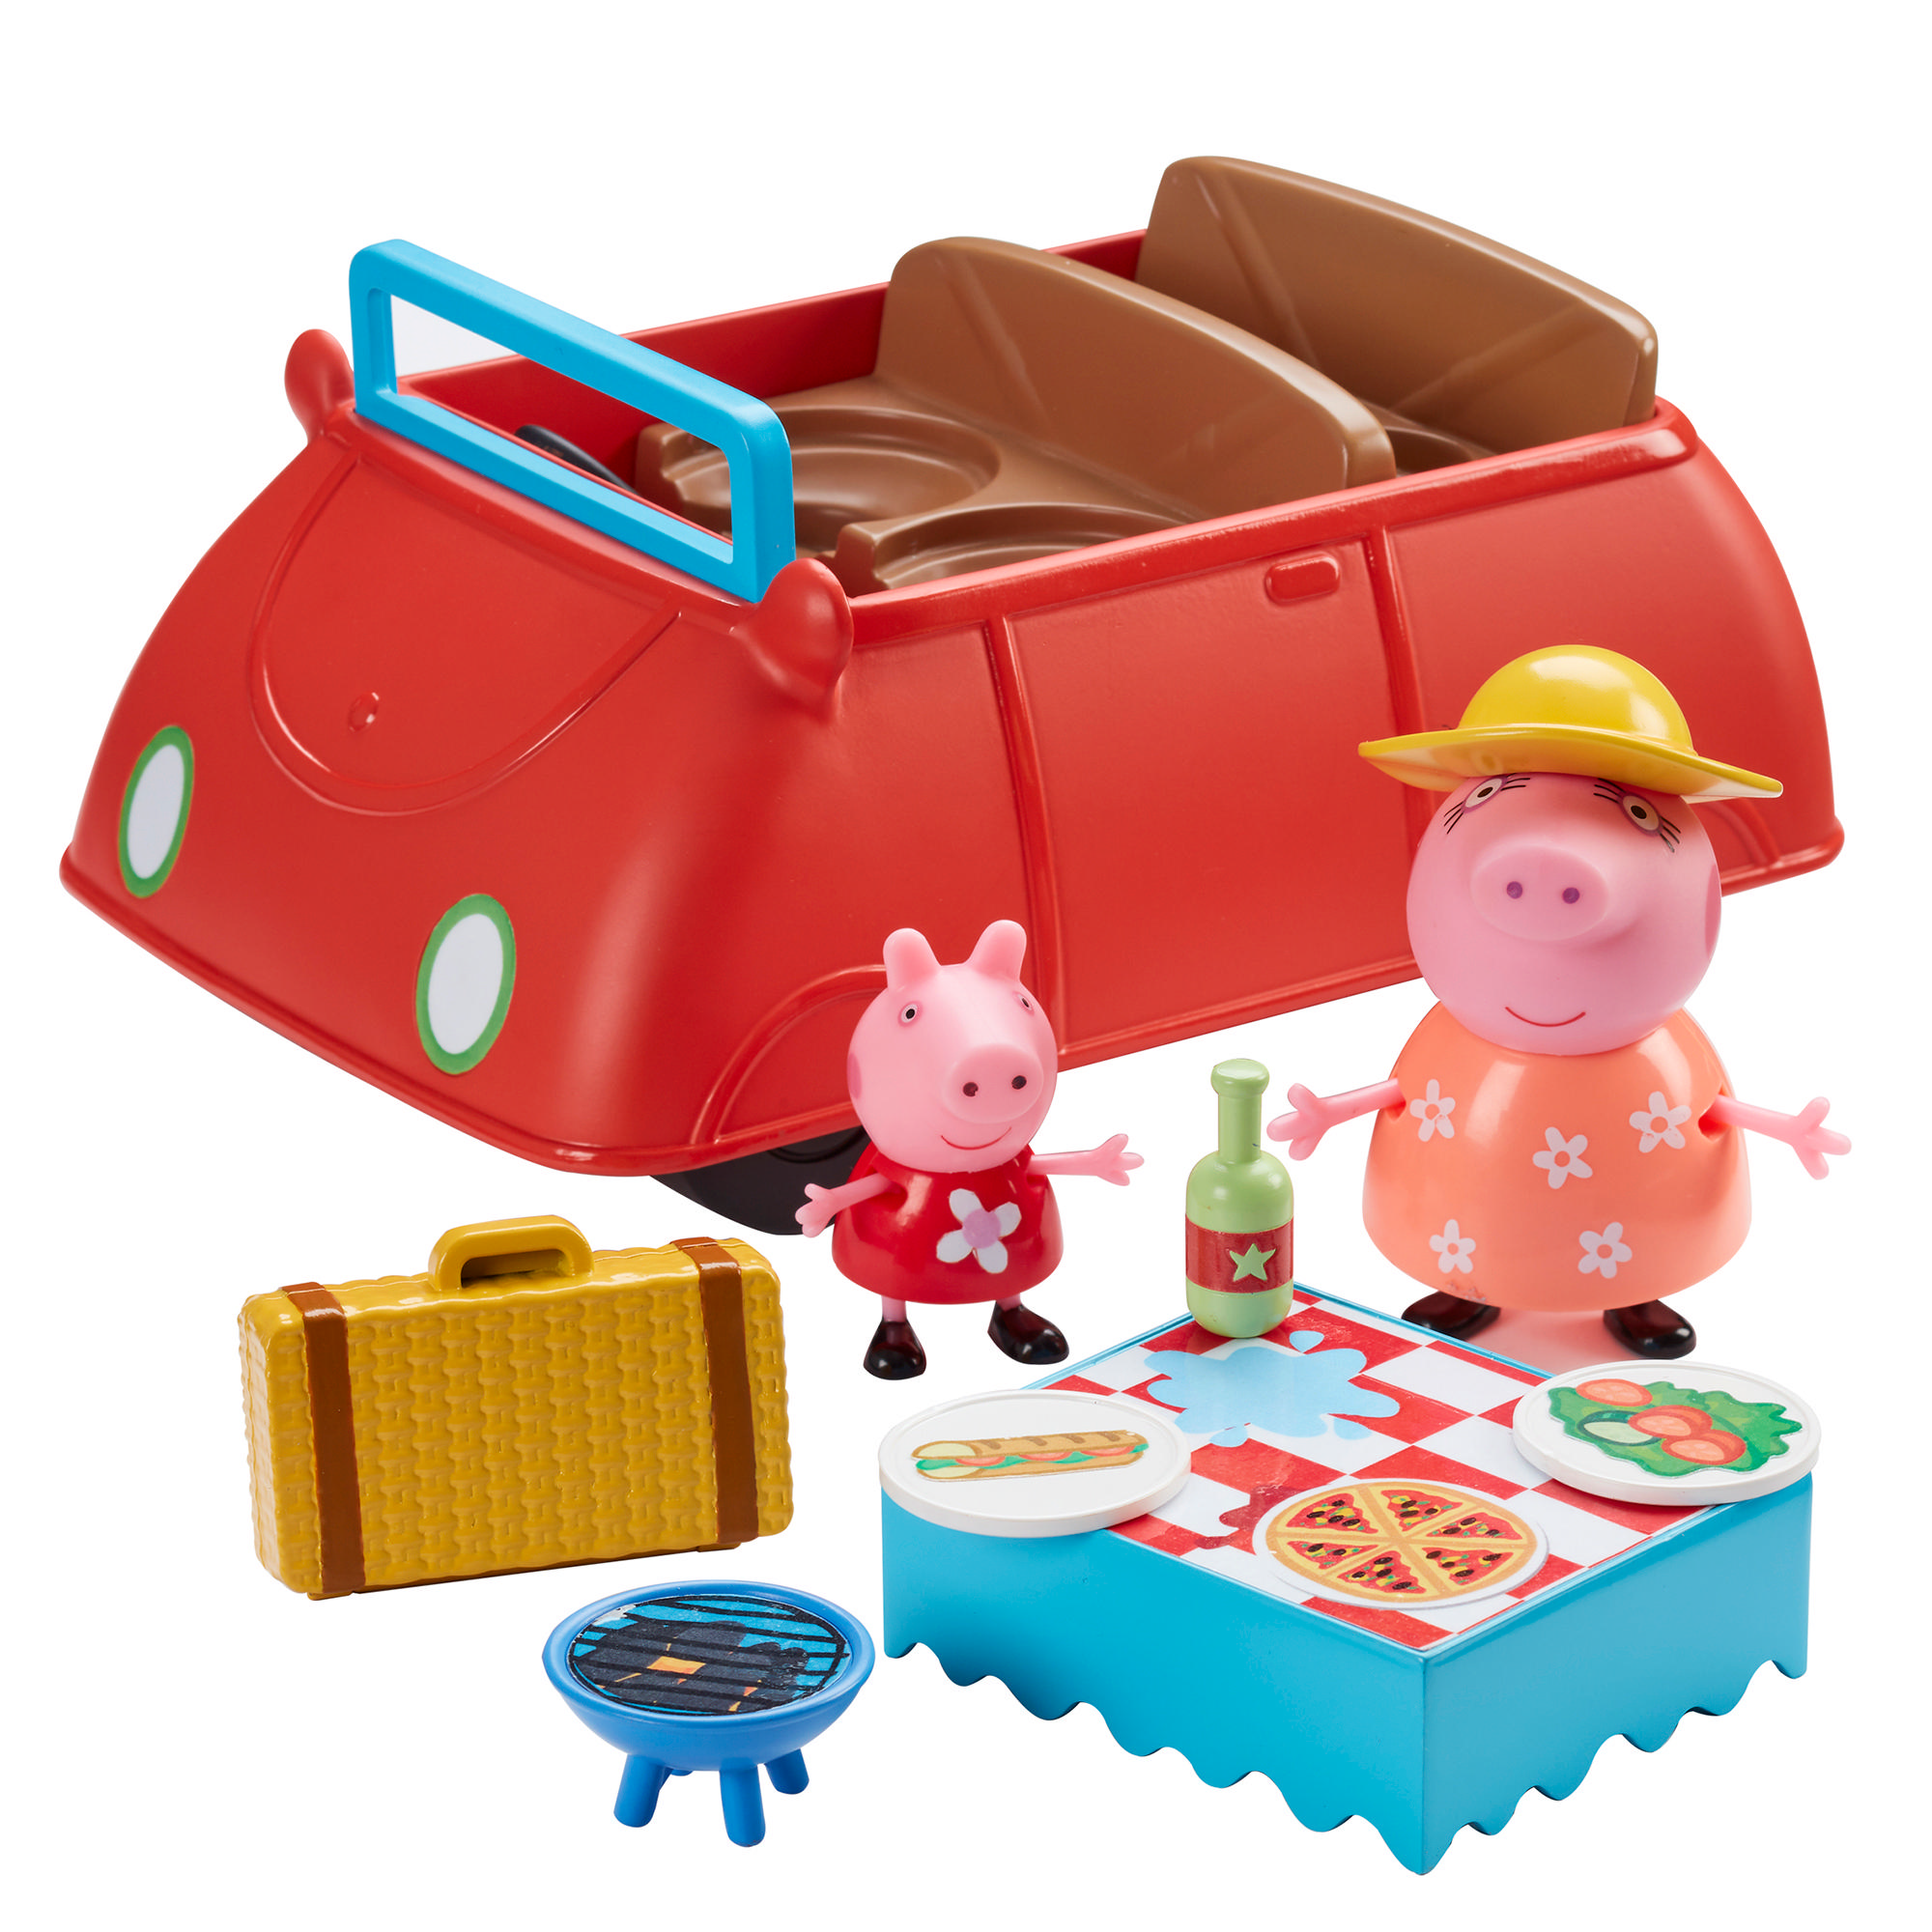 Peppa's Big Red Car